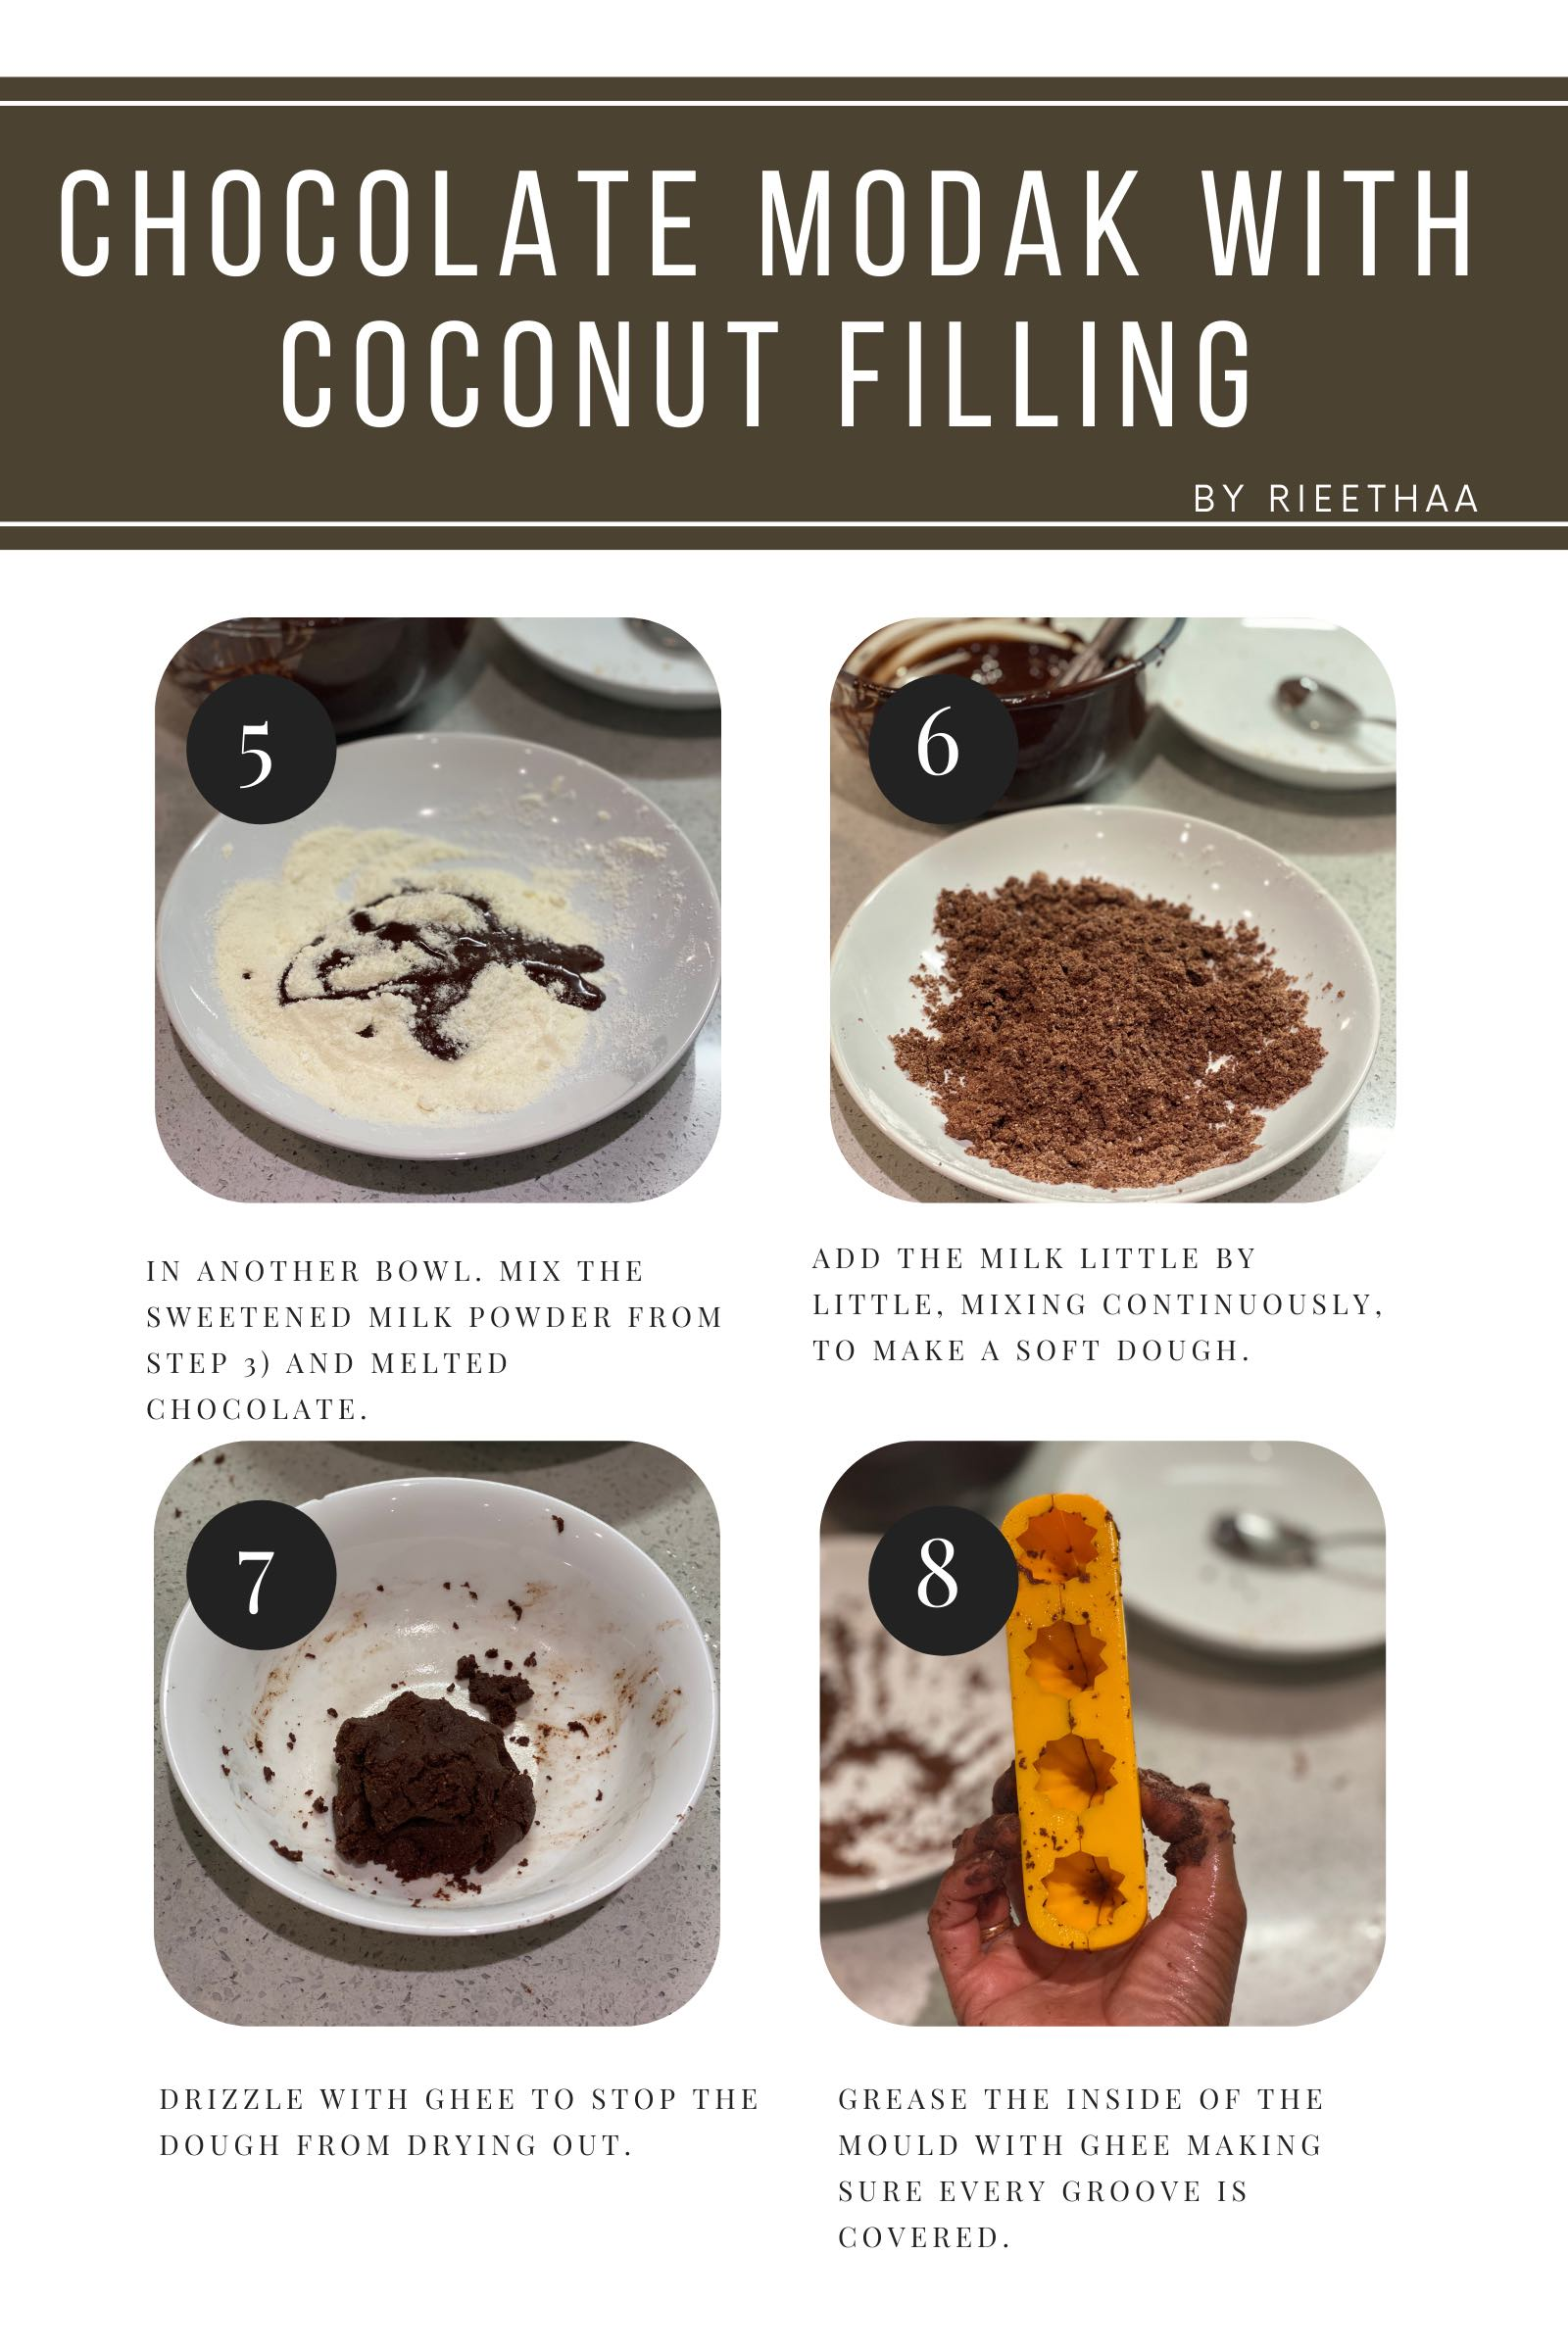 Chocolate modak recipe step.